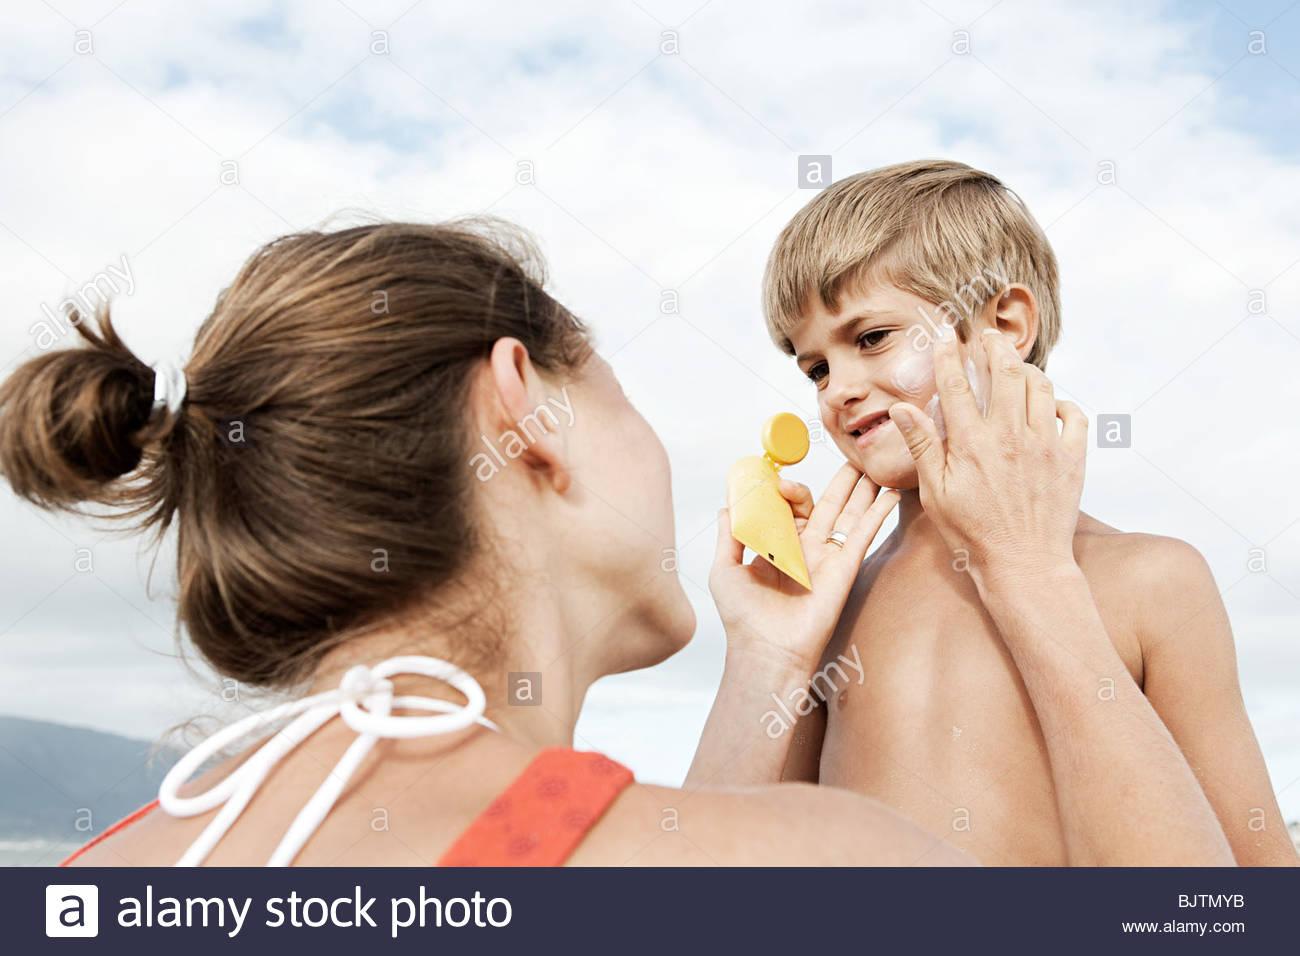 Mother applying suncream to son - Stock Image